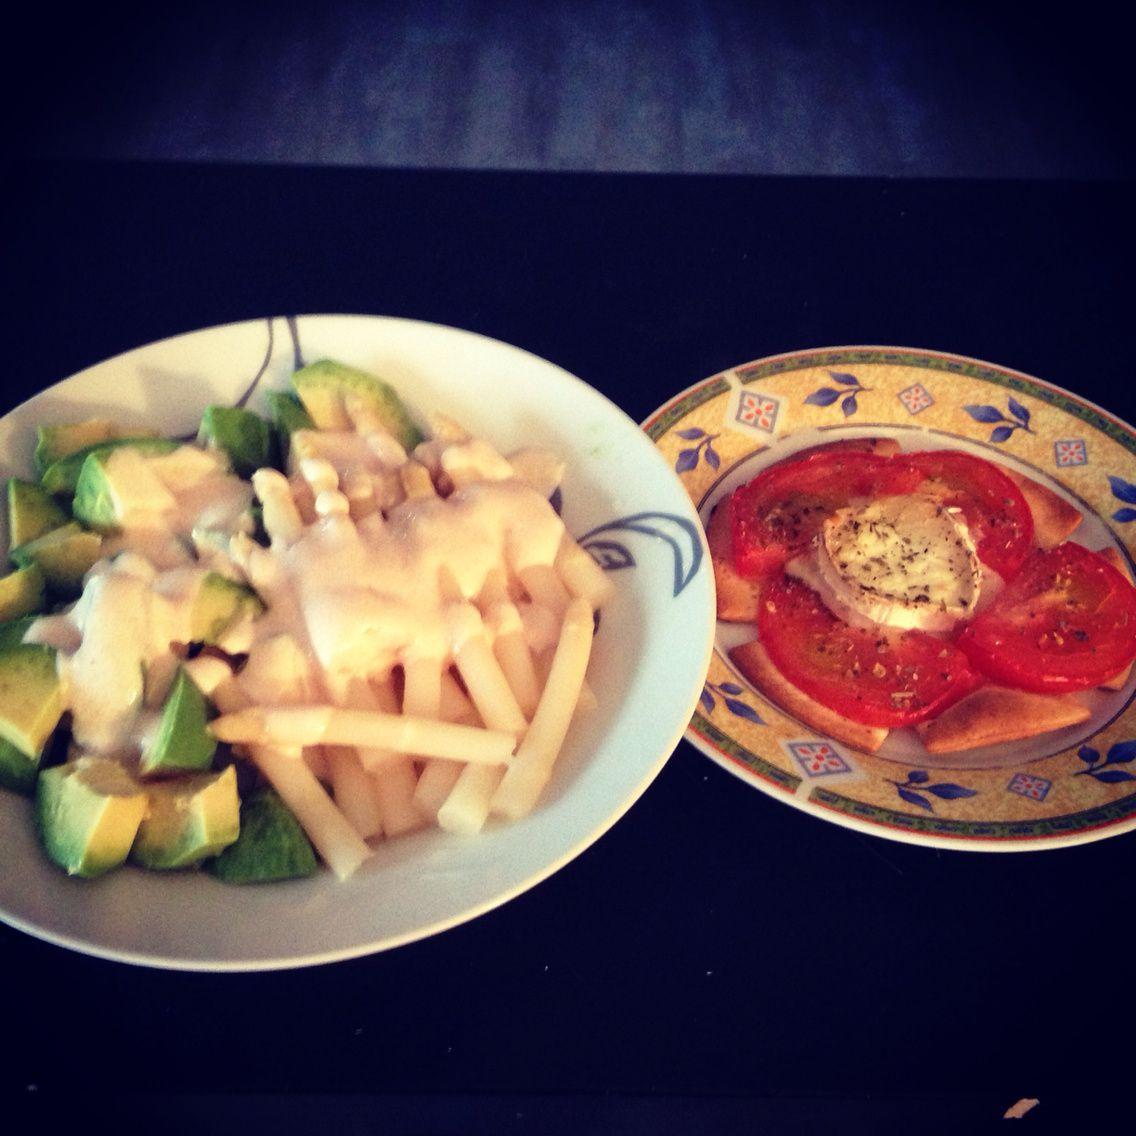 Petites tartelette fines tomates/chèvre/basilic